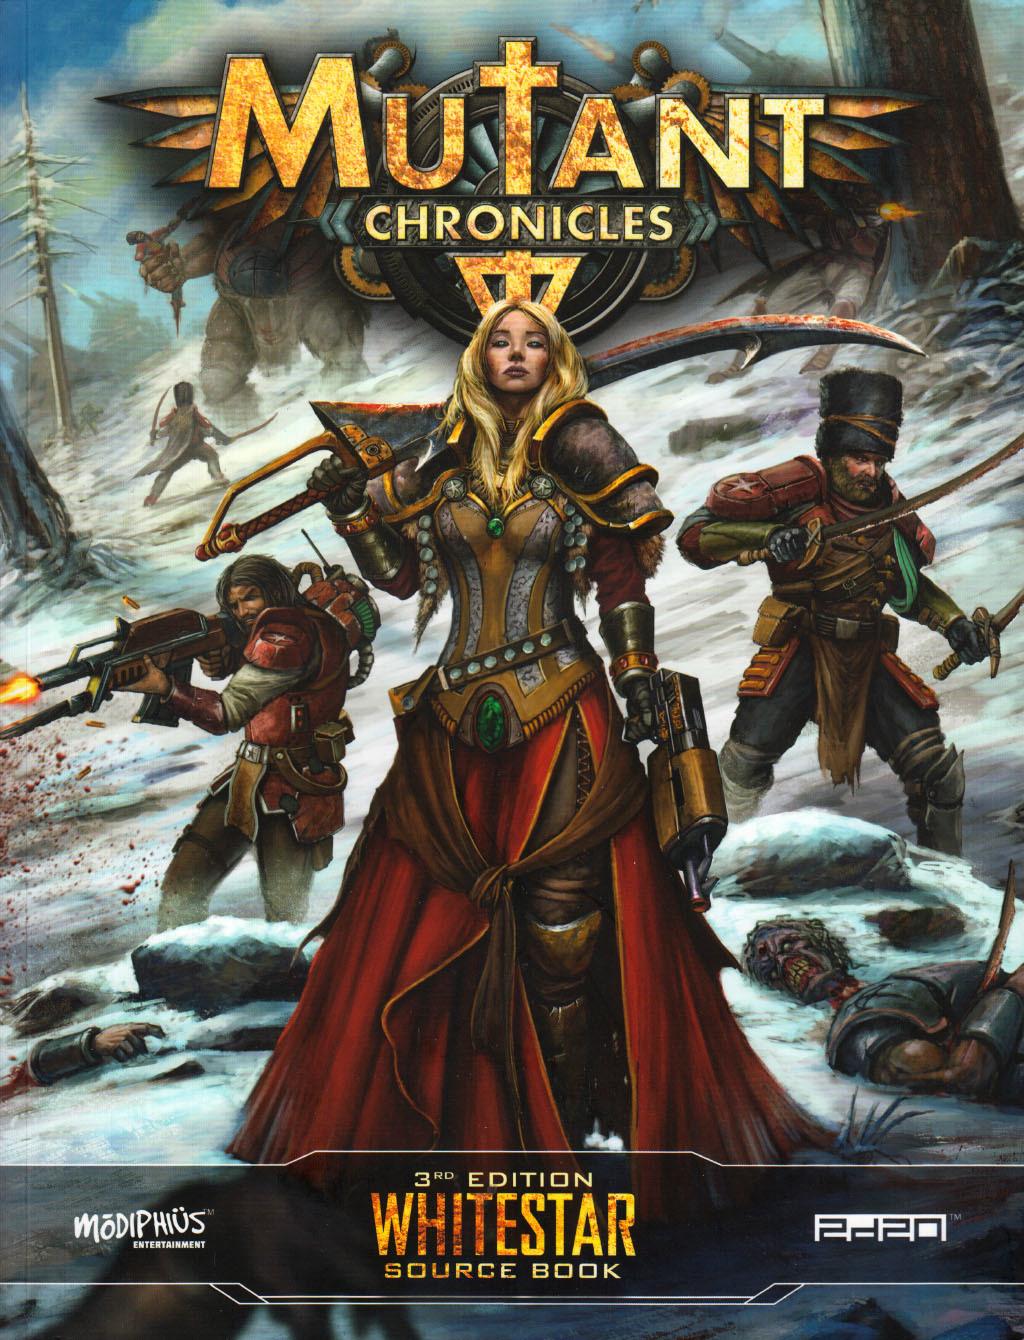 Whitestar source book (Mutant Chronicles 3rd edition)